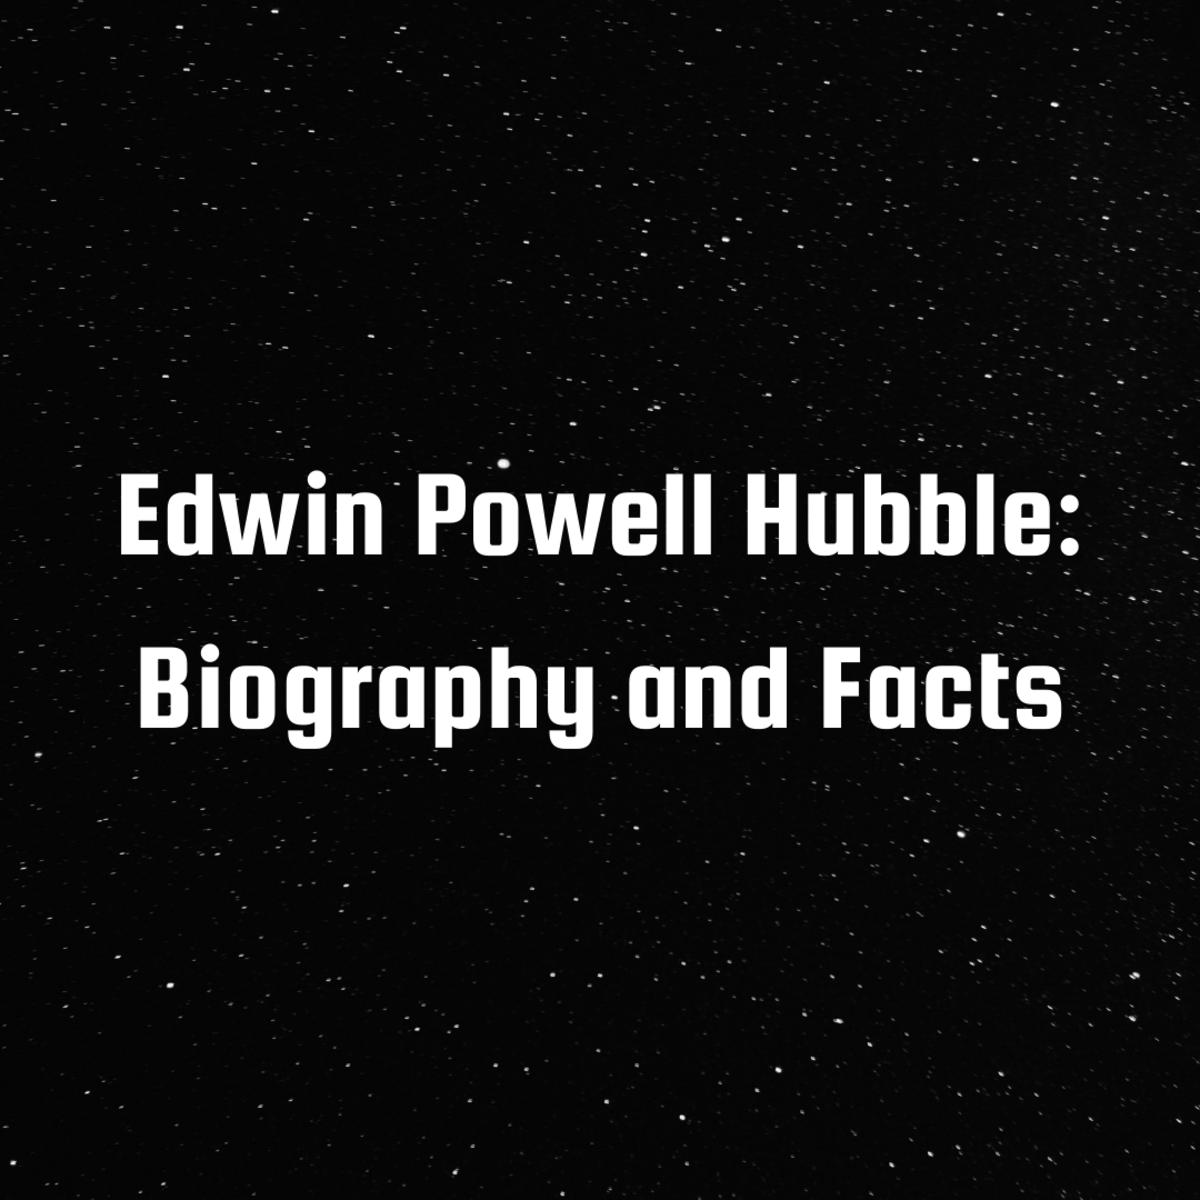 Edwin Powell Hubble: Father of Modern Cosmology